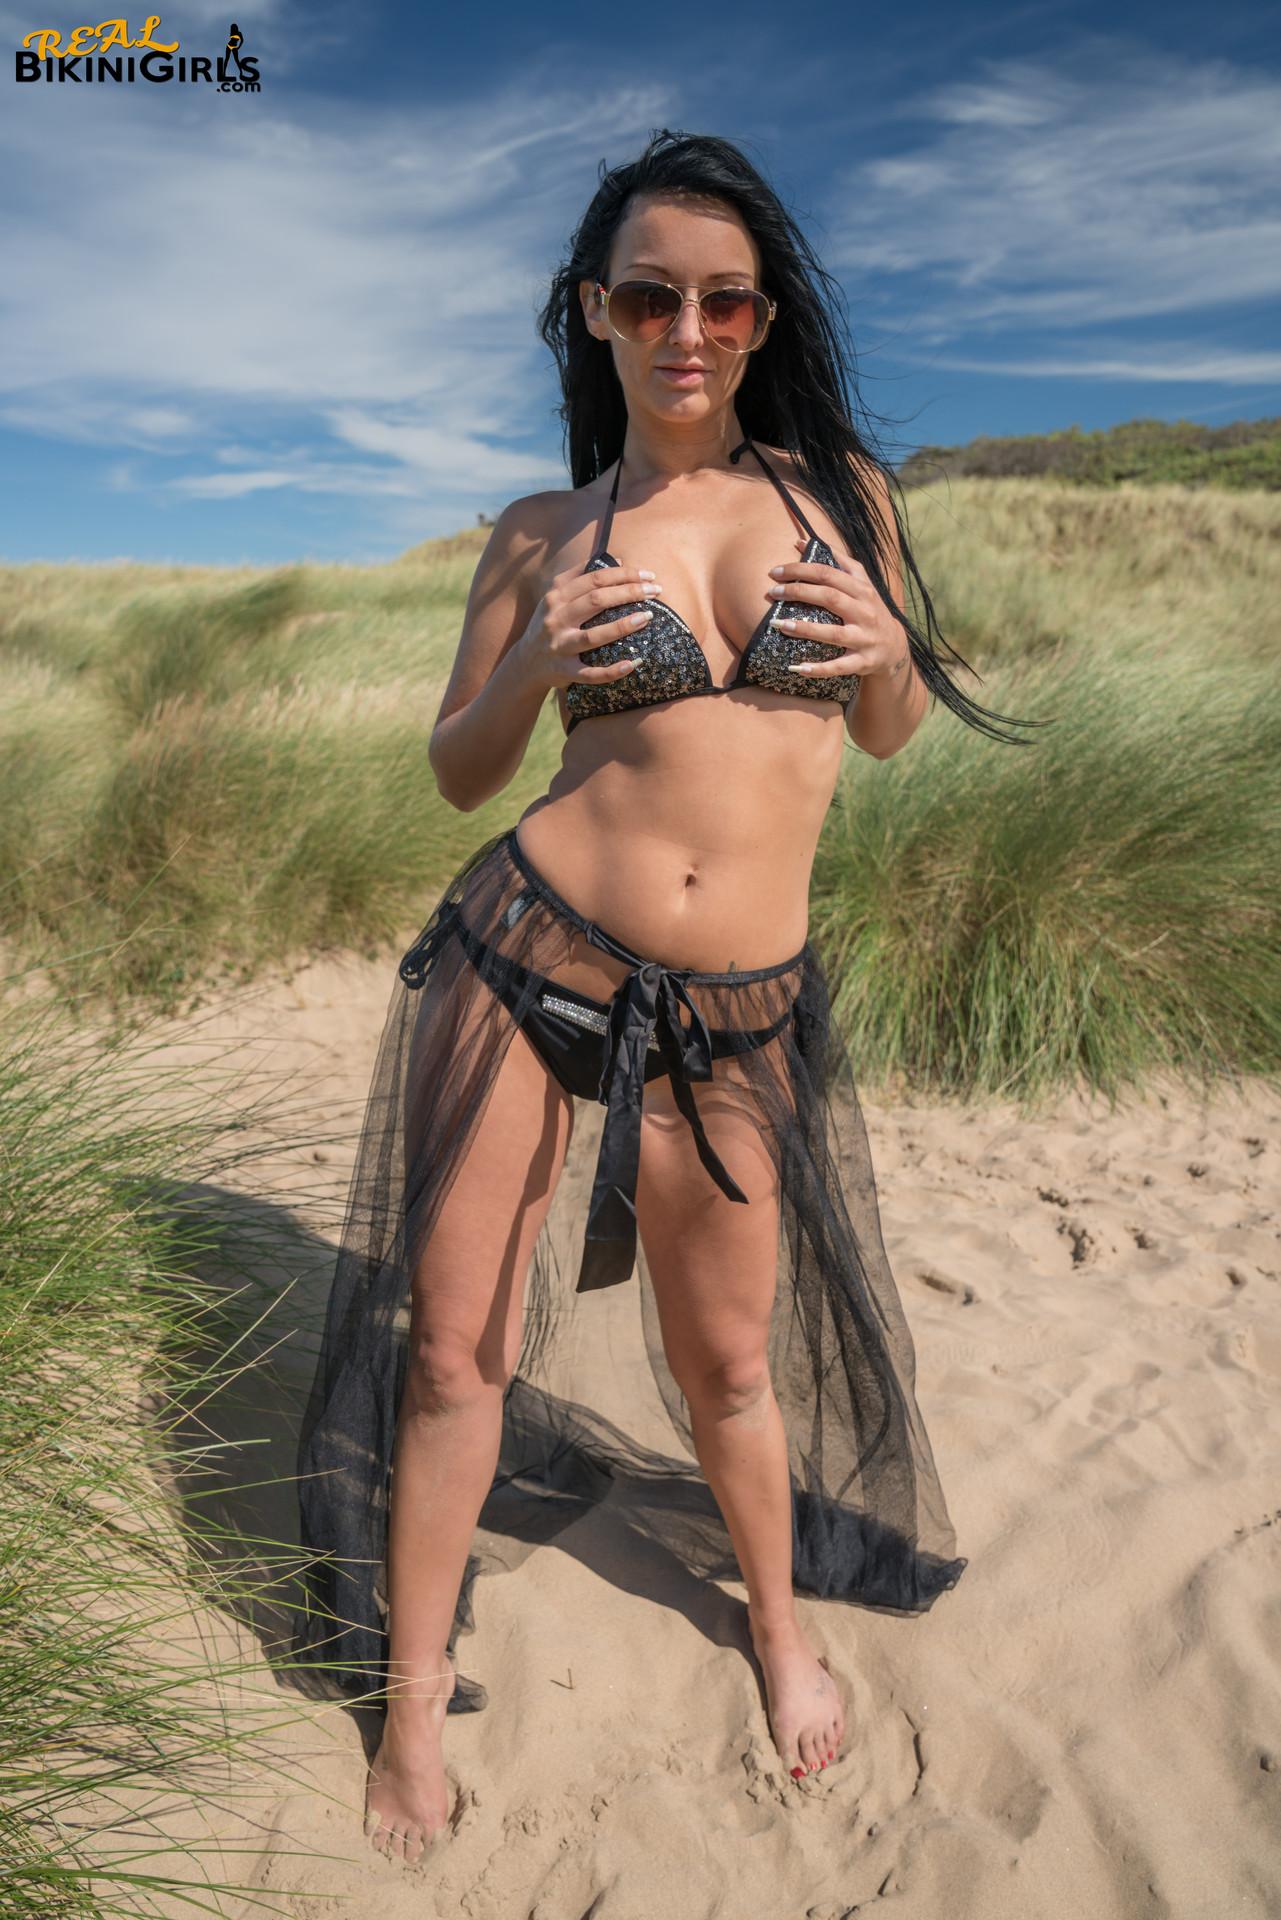 Sparkling In The Sun - Real Bikini Girls